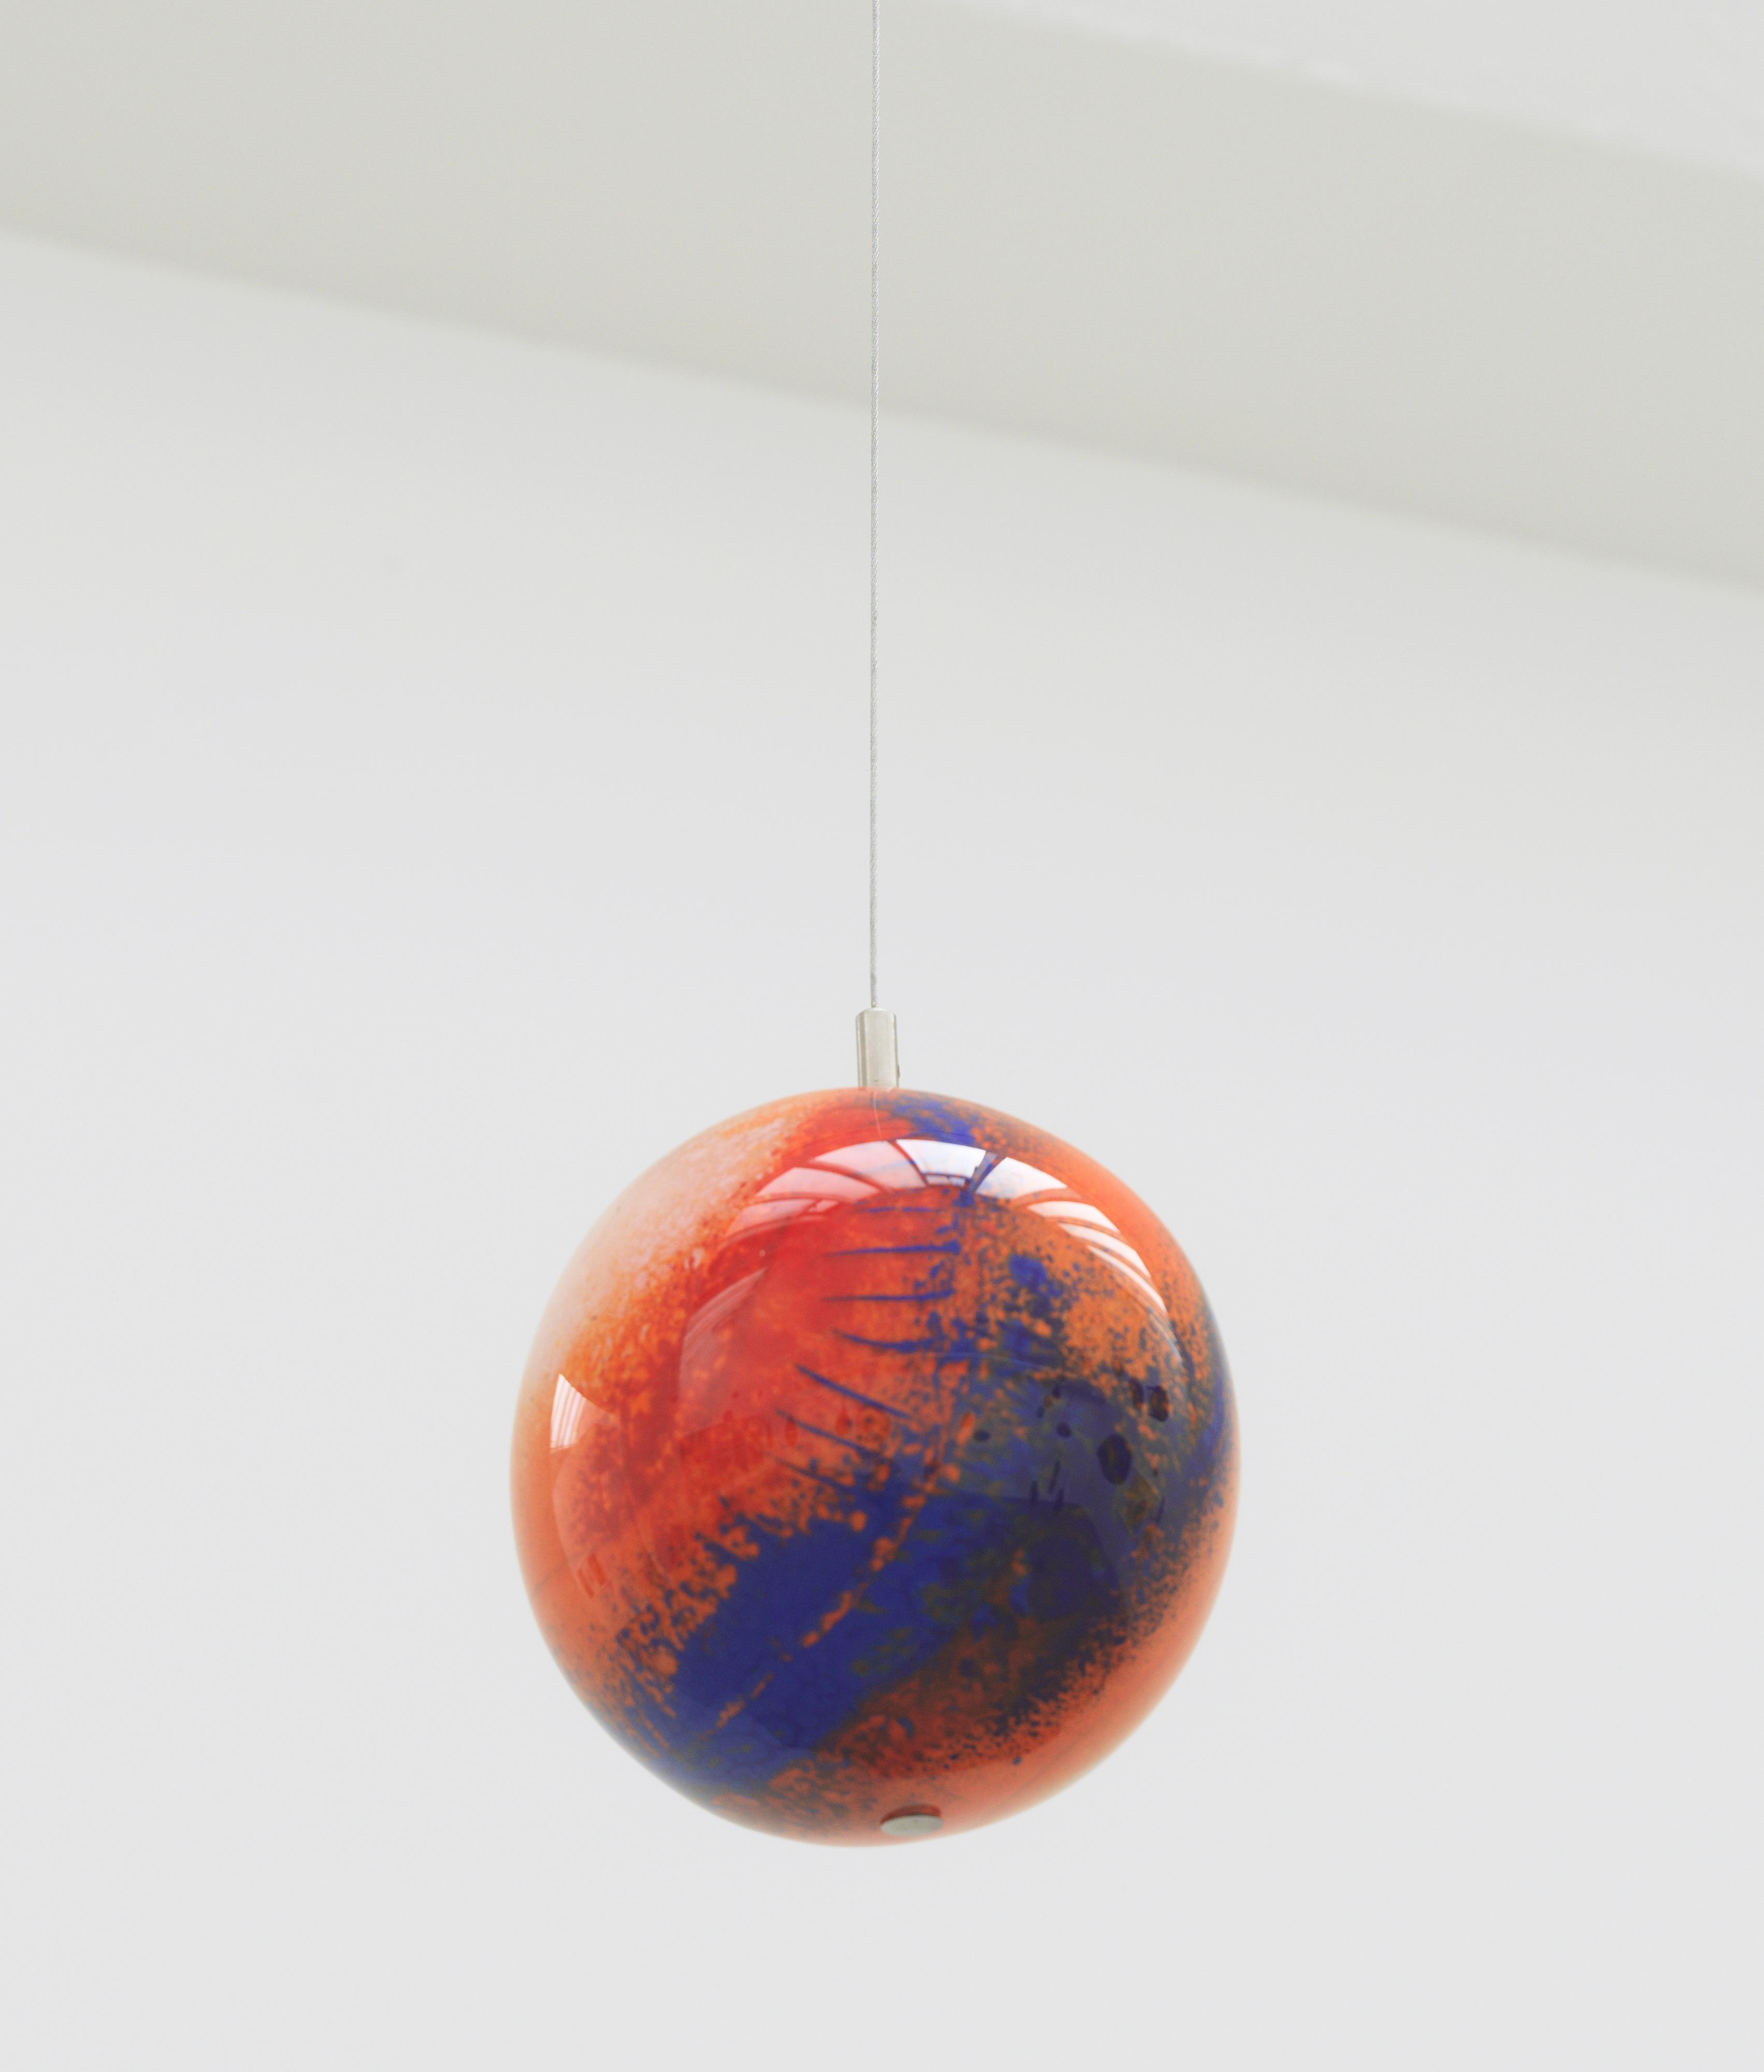 Galerie Barbara Thumm \ María Magdalena Campos-Pons – Single #2, 2021, MCP-21-009 \ Single #2 (2021)